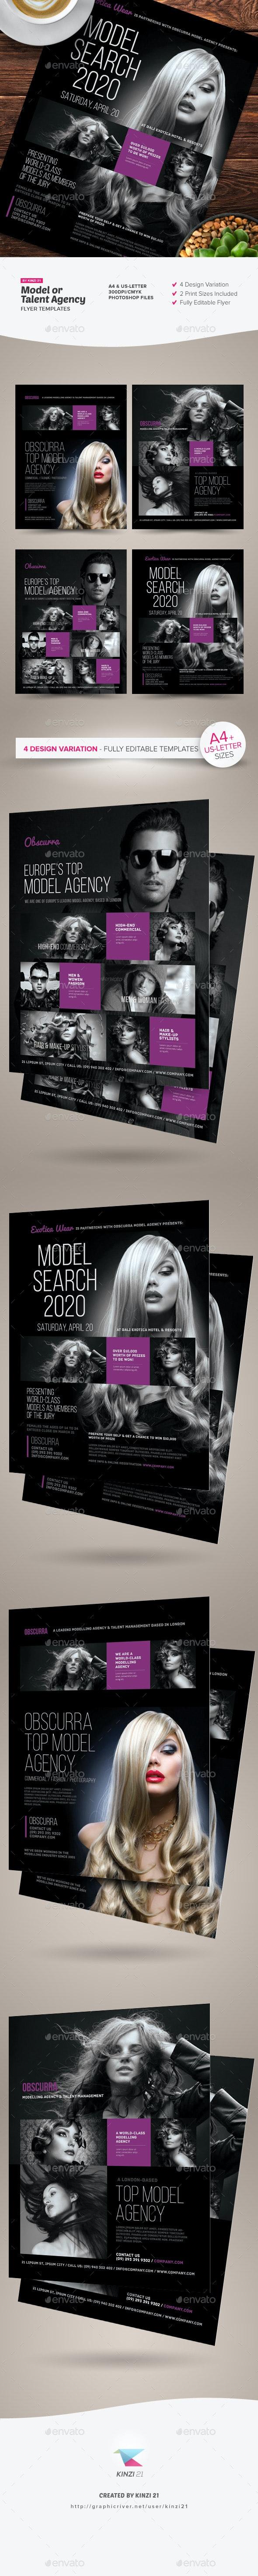 Model or Talent Agency Flyers - Corporate Flyers